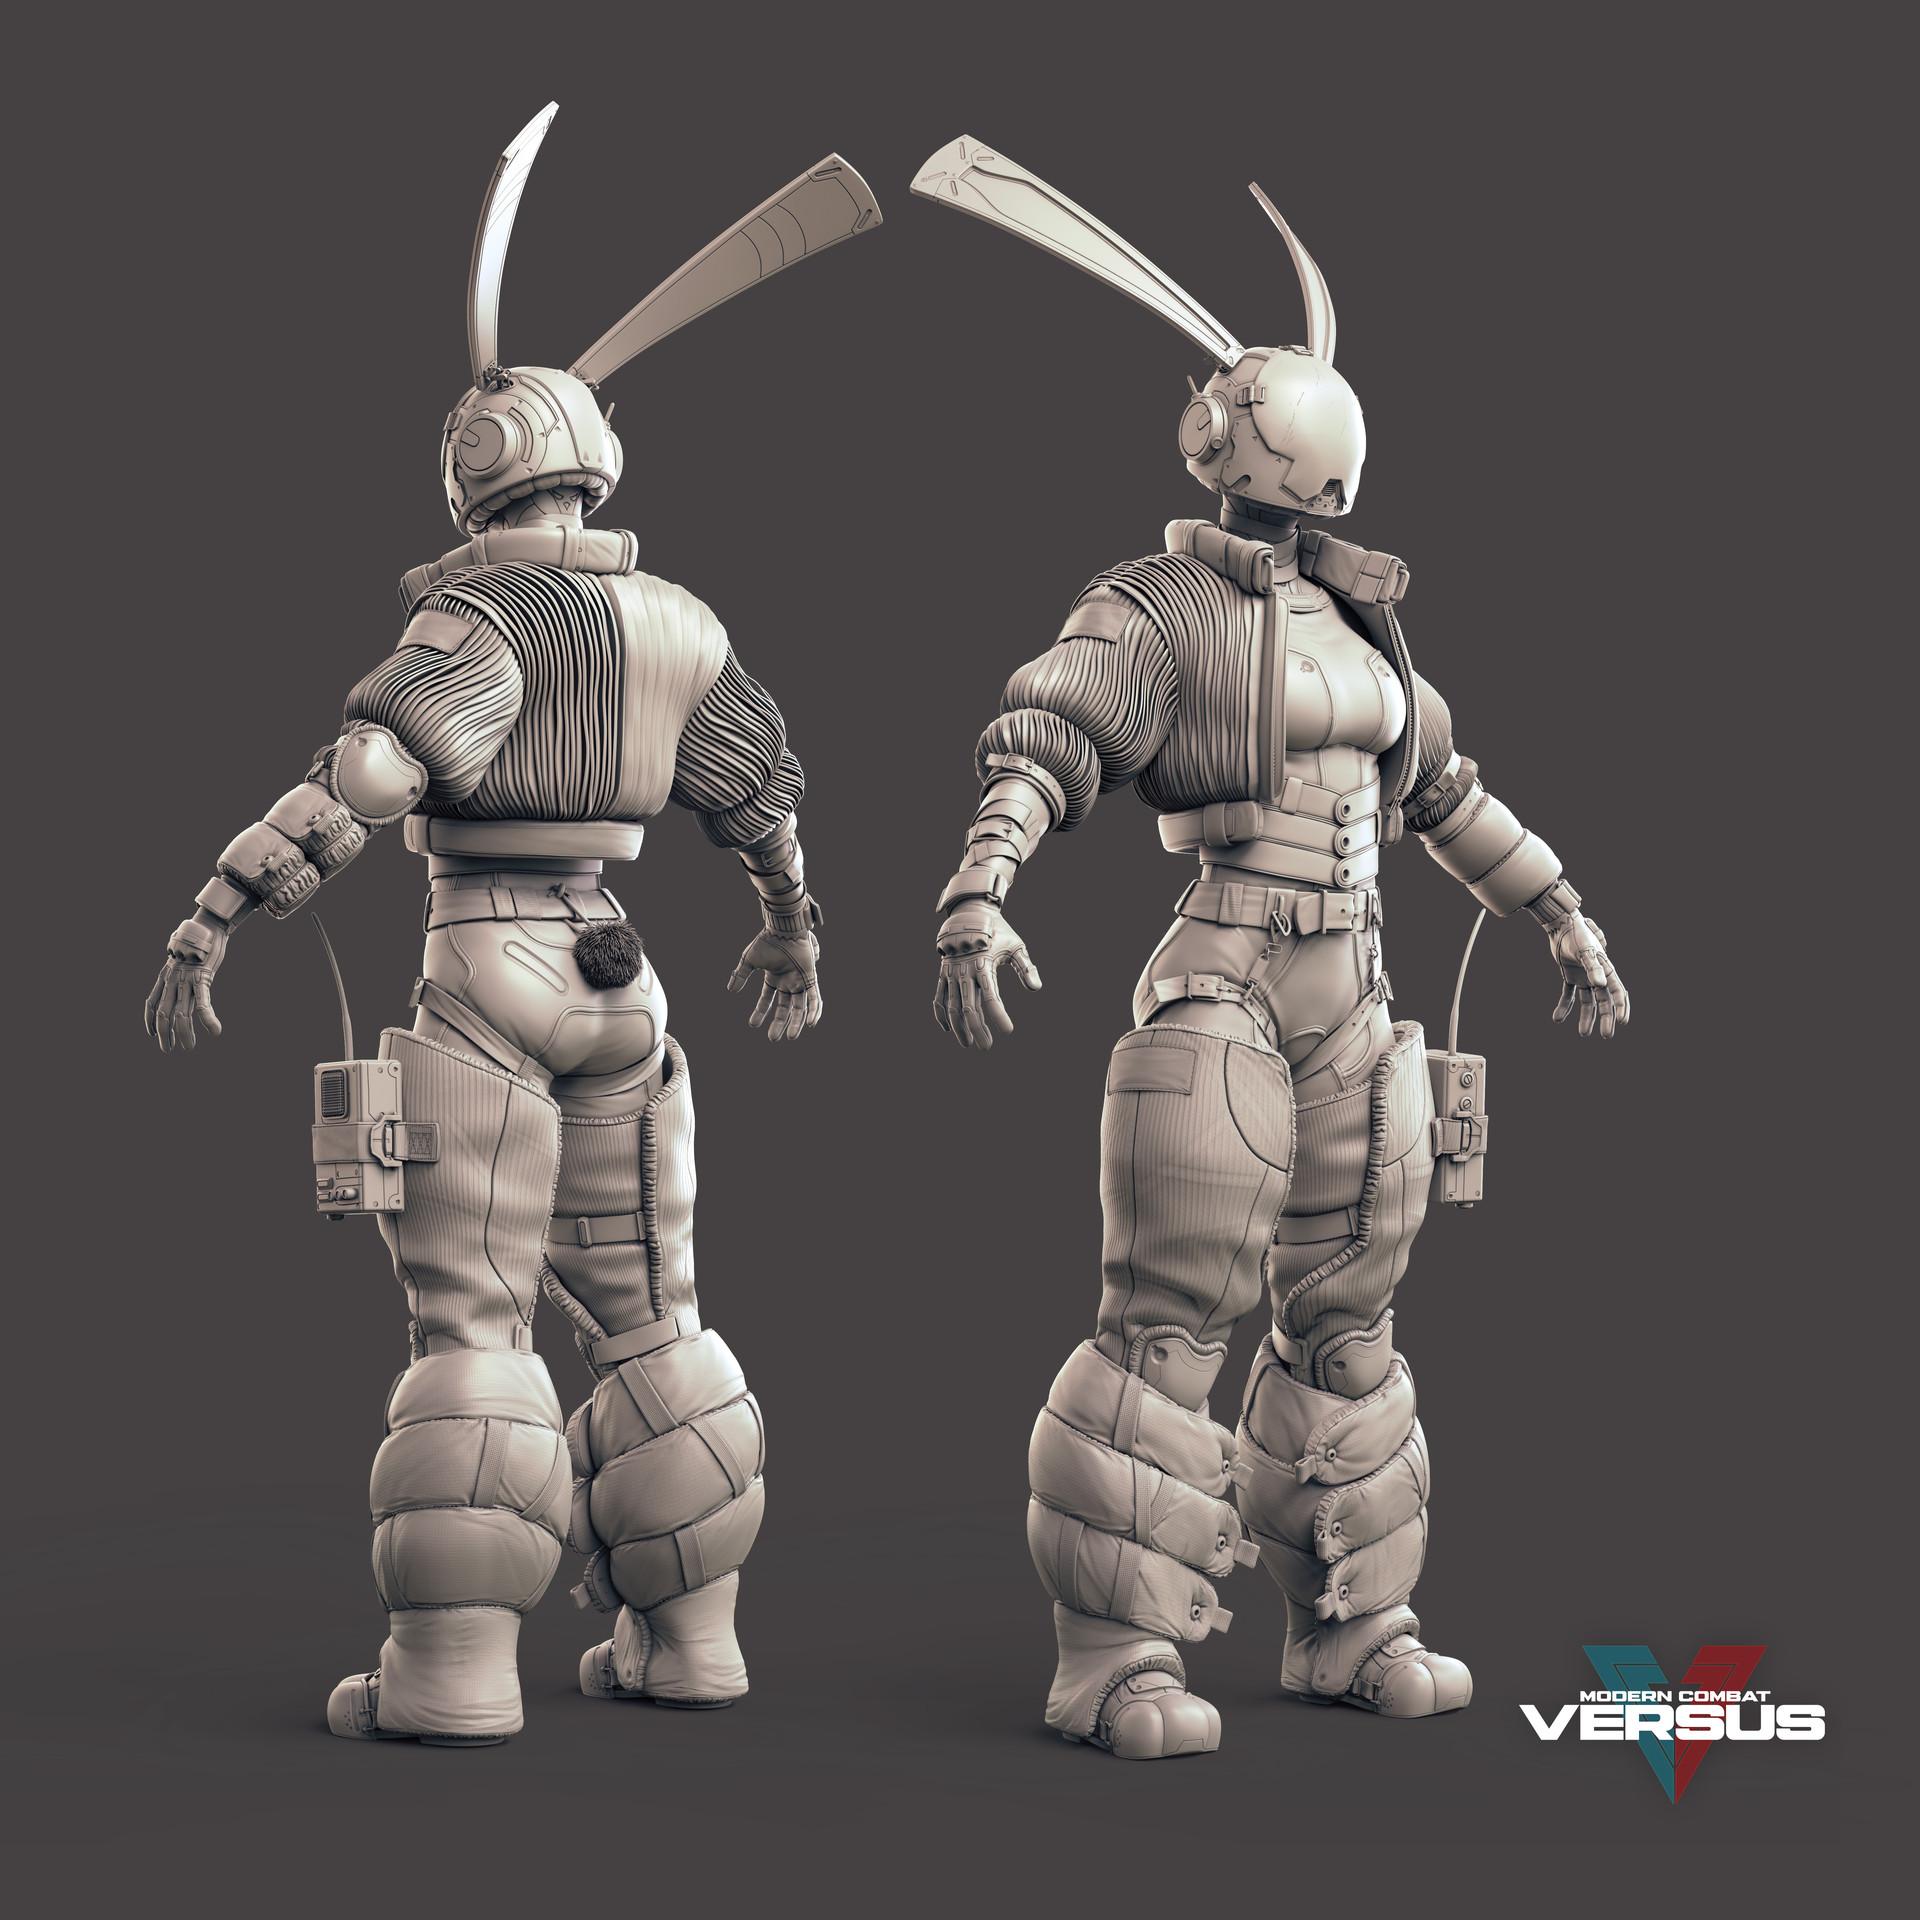 Alexandre proulx audy ks swift bunny 1